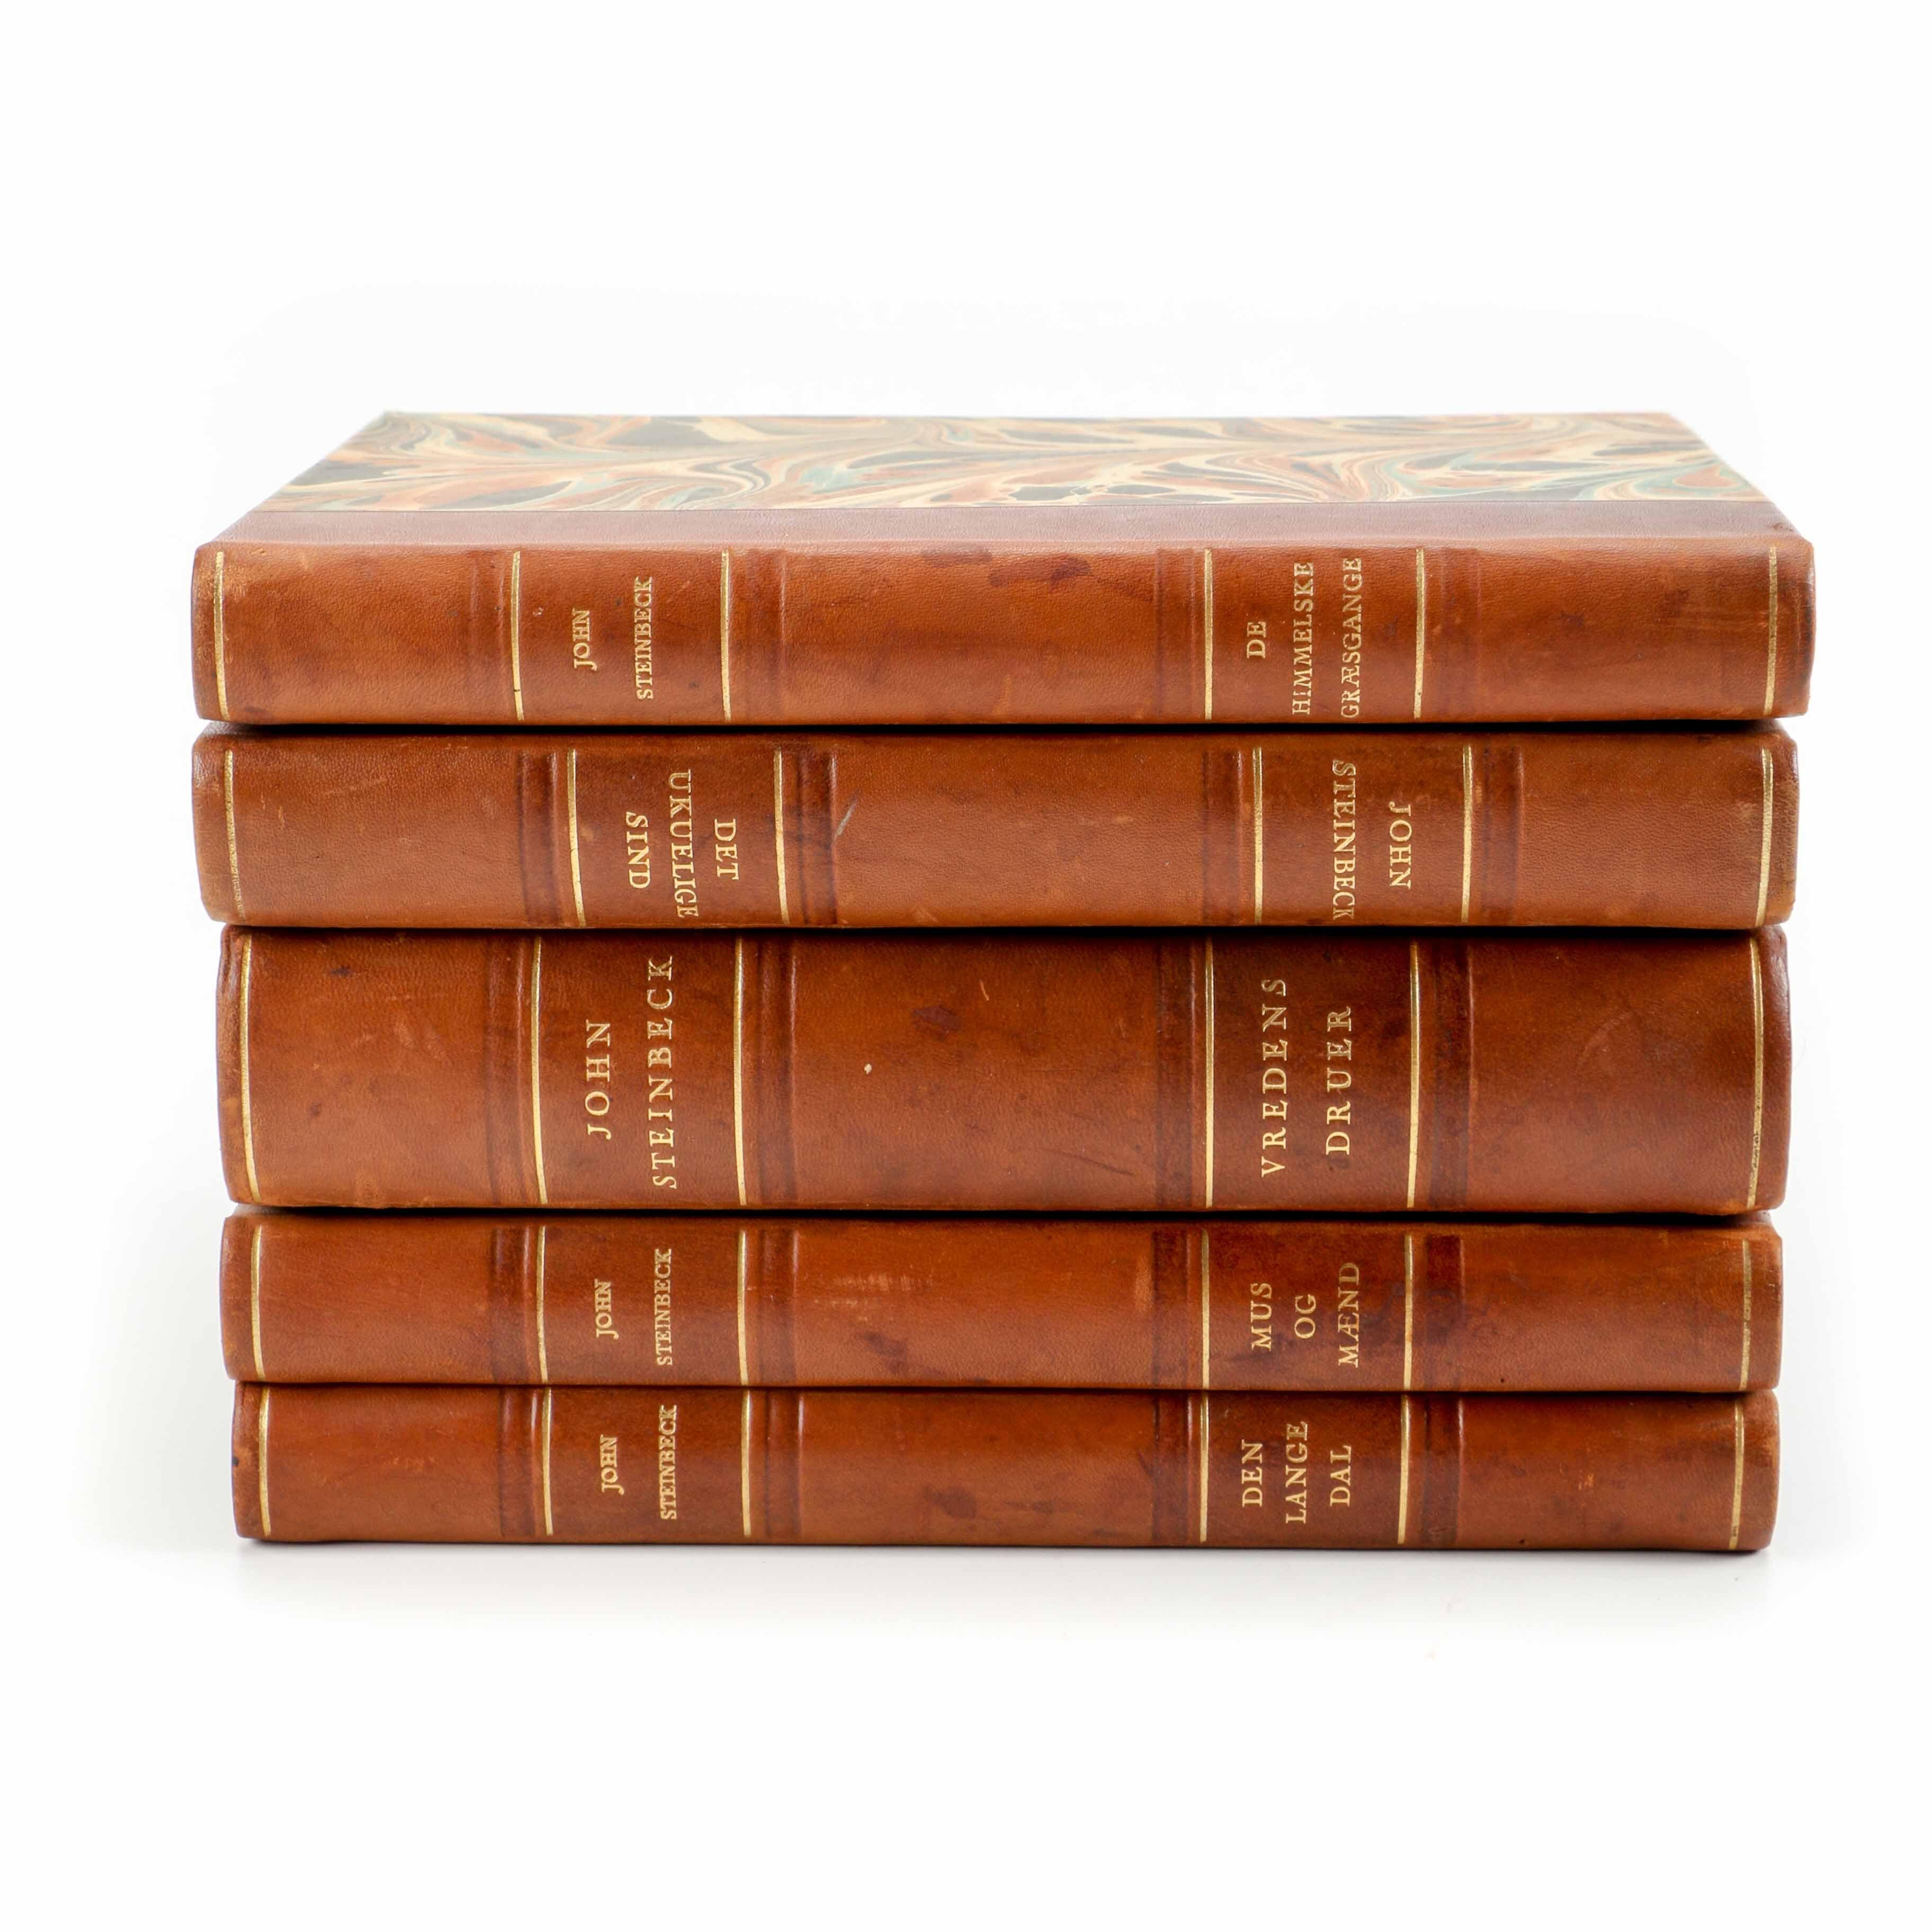 John Steinbeck Novels in Danish